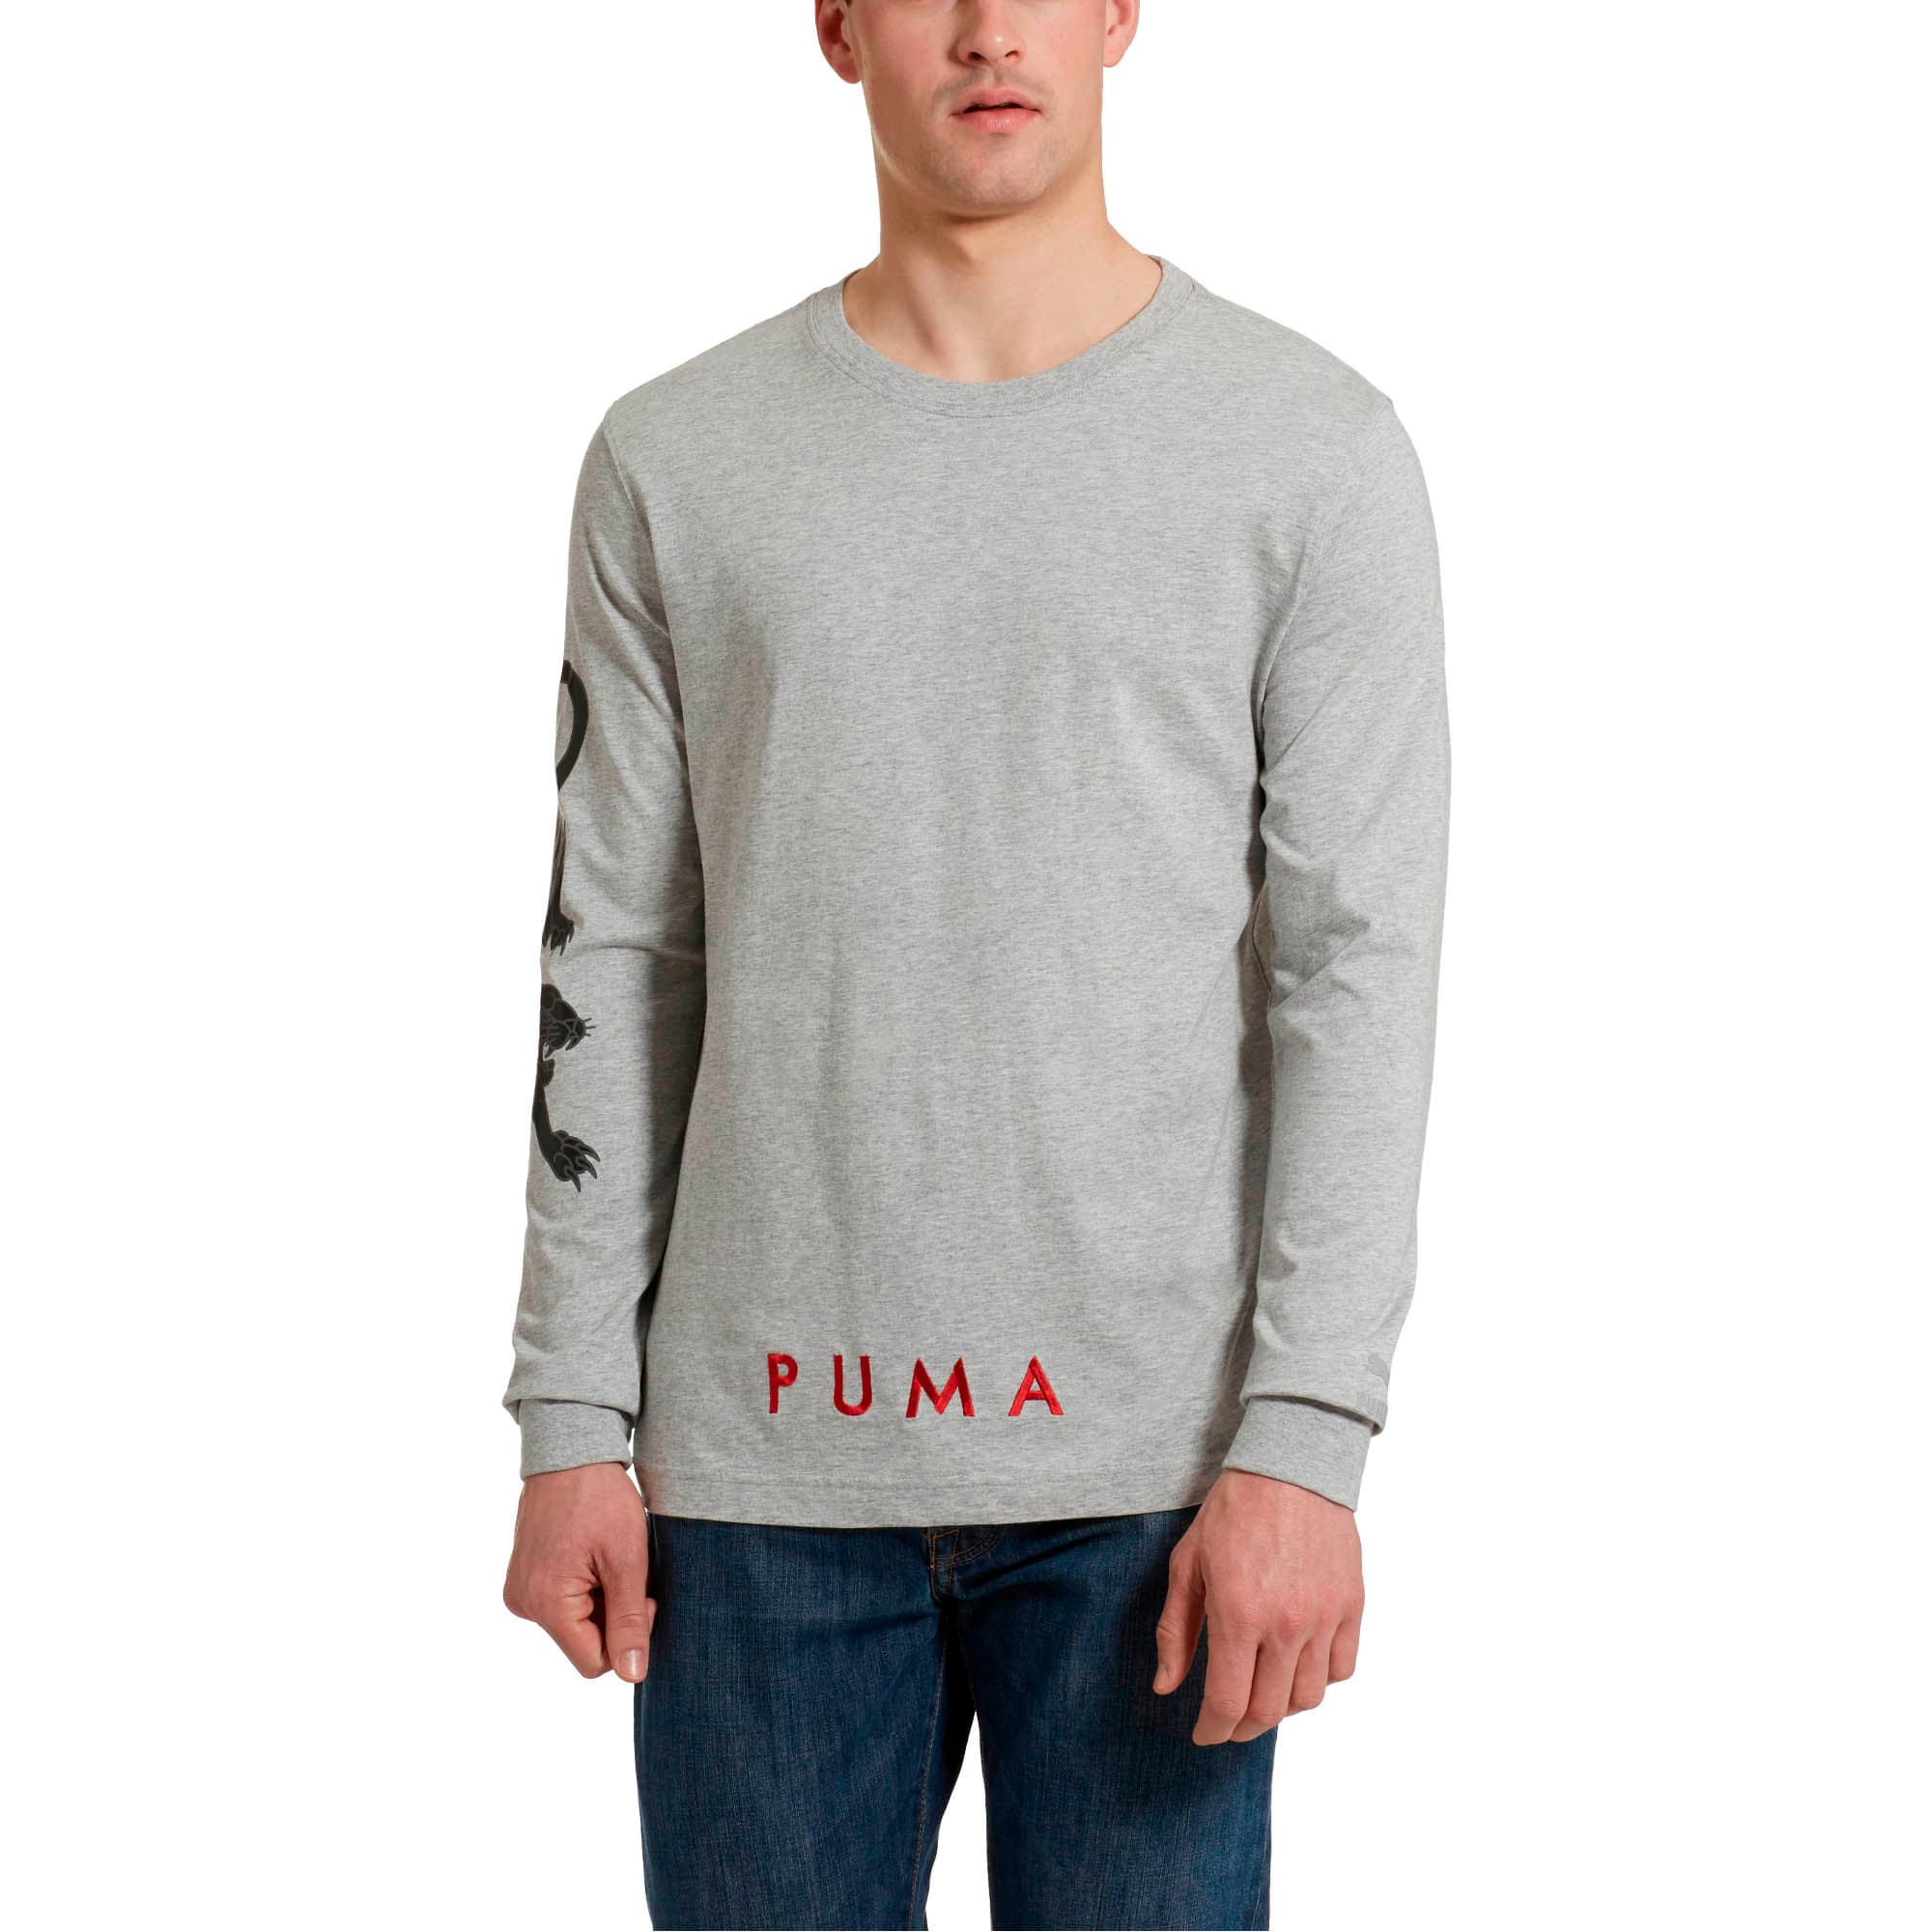 Miniatura 1 de Camiseta de mangas largas Last Dayz para hombre, Light Gray Heather, mediano